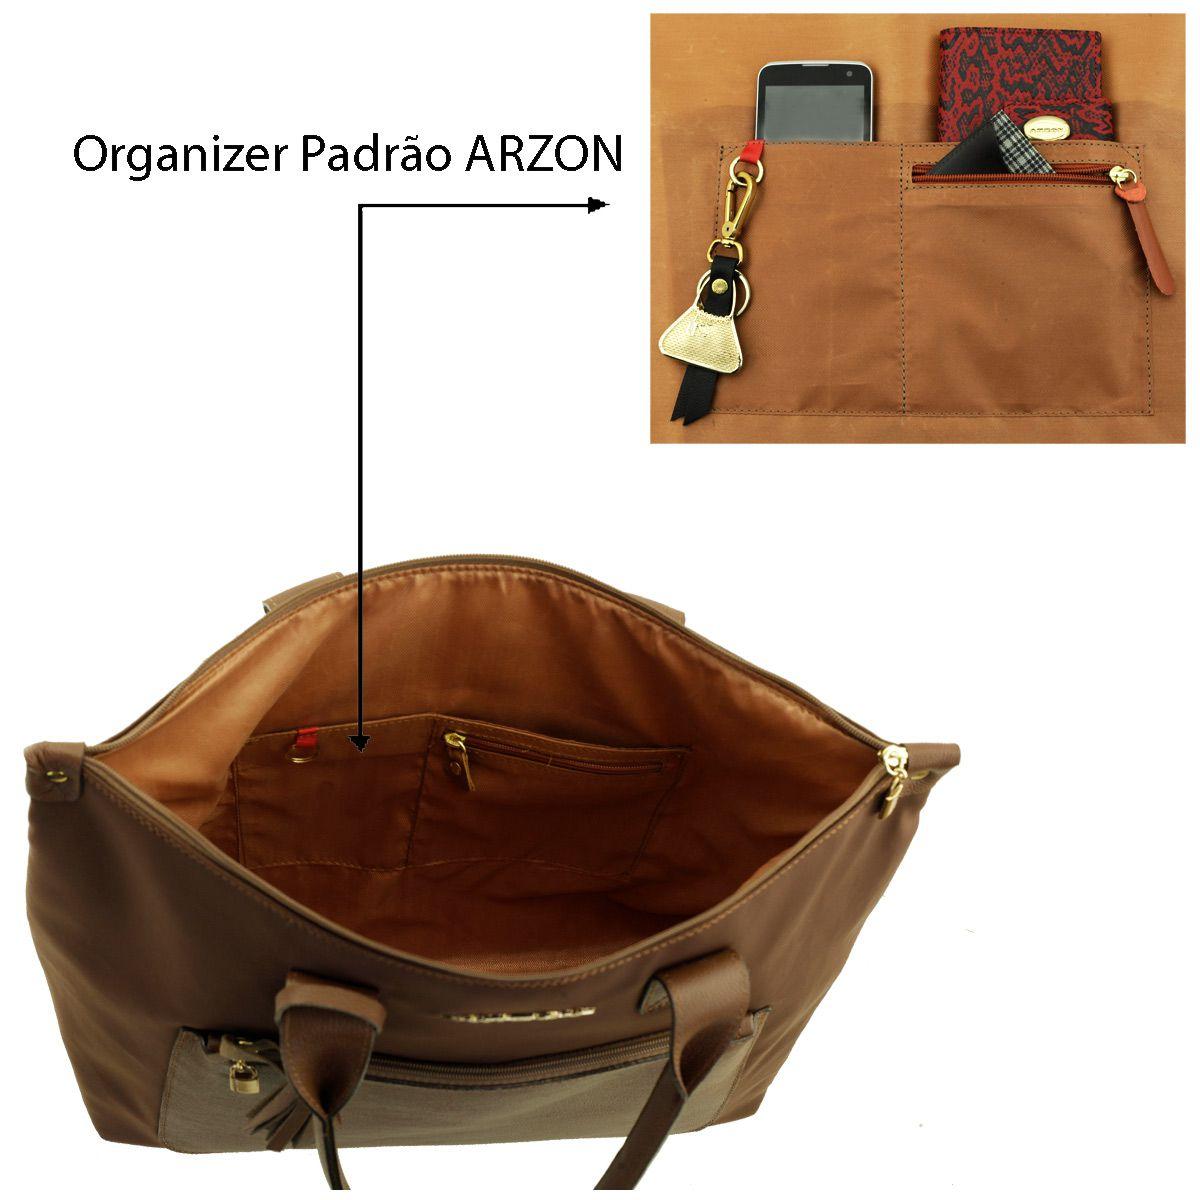 Bolsa ARZON de Nylon com Couro Chocolate